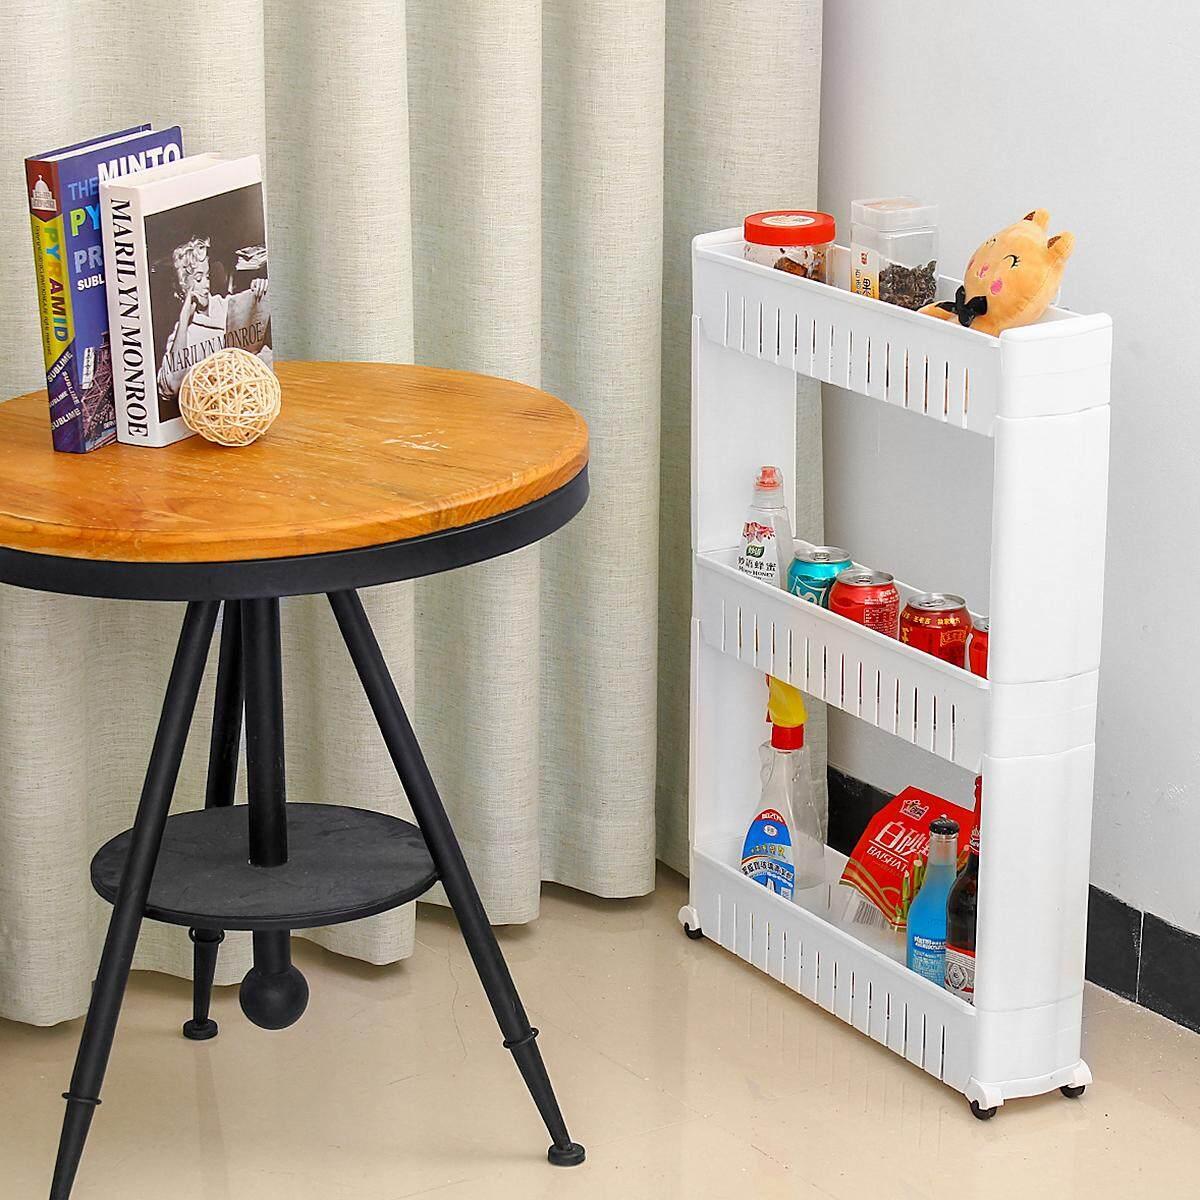 Slim Slide Out 3 Tier Storage Trolley Kitchen Bathroom Laundry w/Wheel Rolling